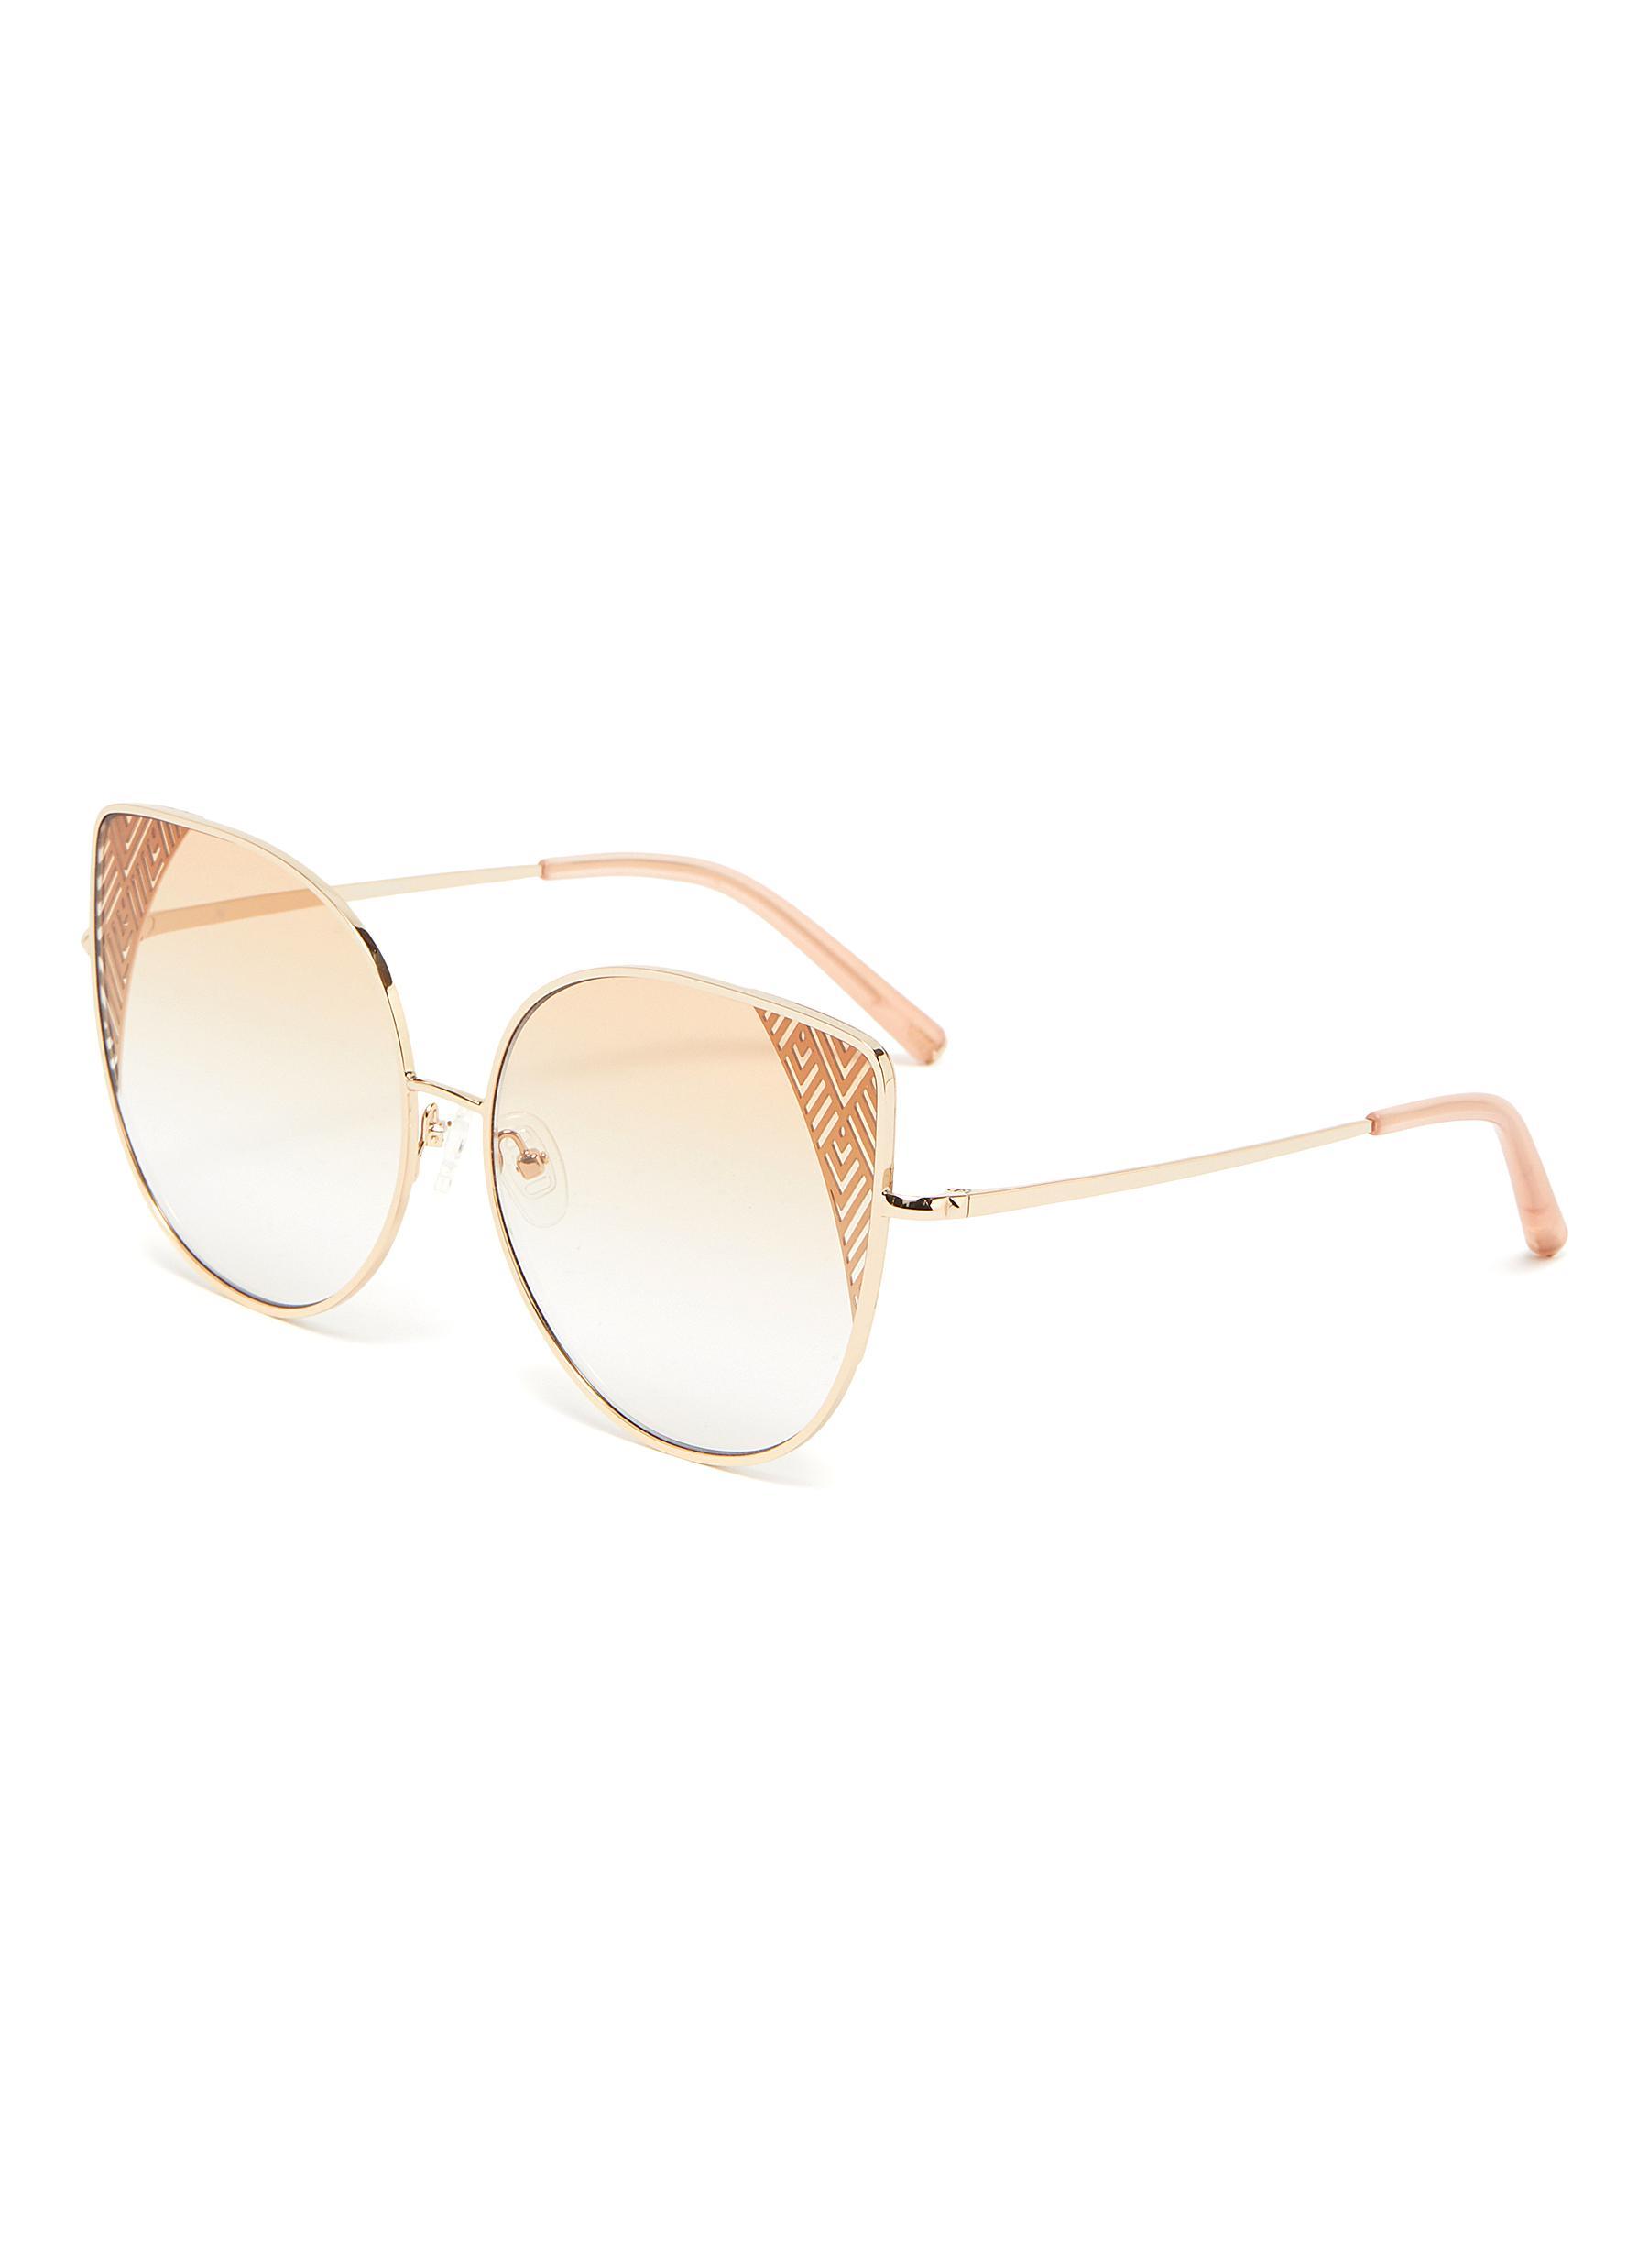 Metal frame cat eye sunglasses - MATTHEW WILLIAMSON - Modalova